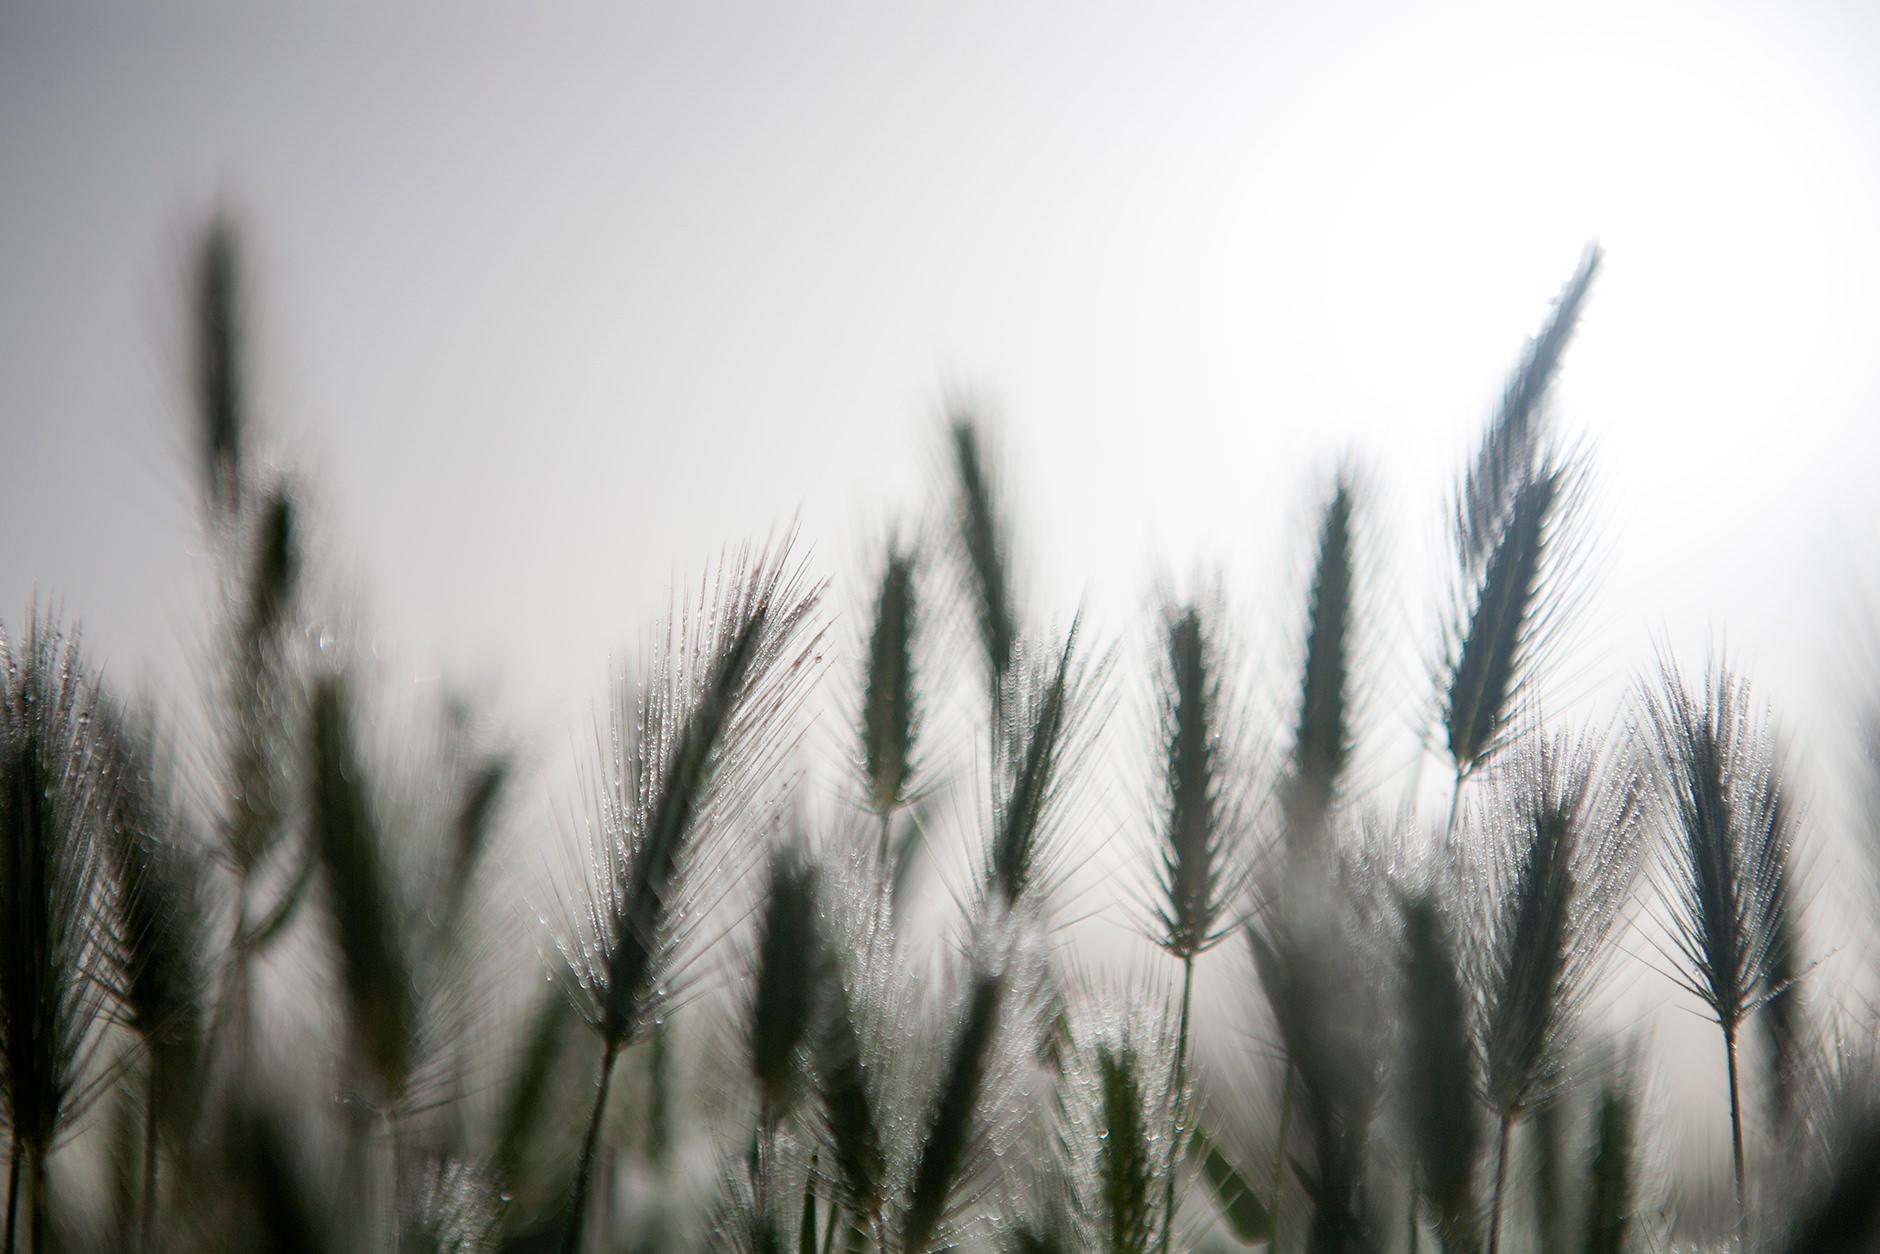 Michelle Grant | Stillness